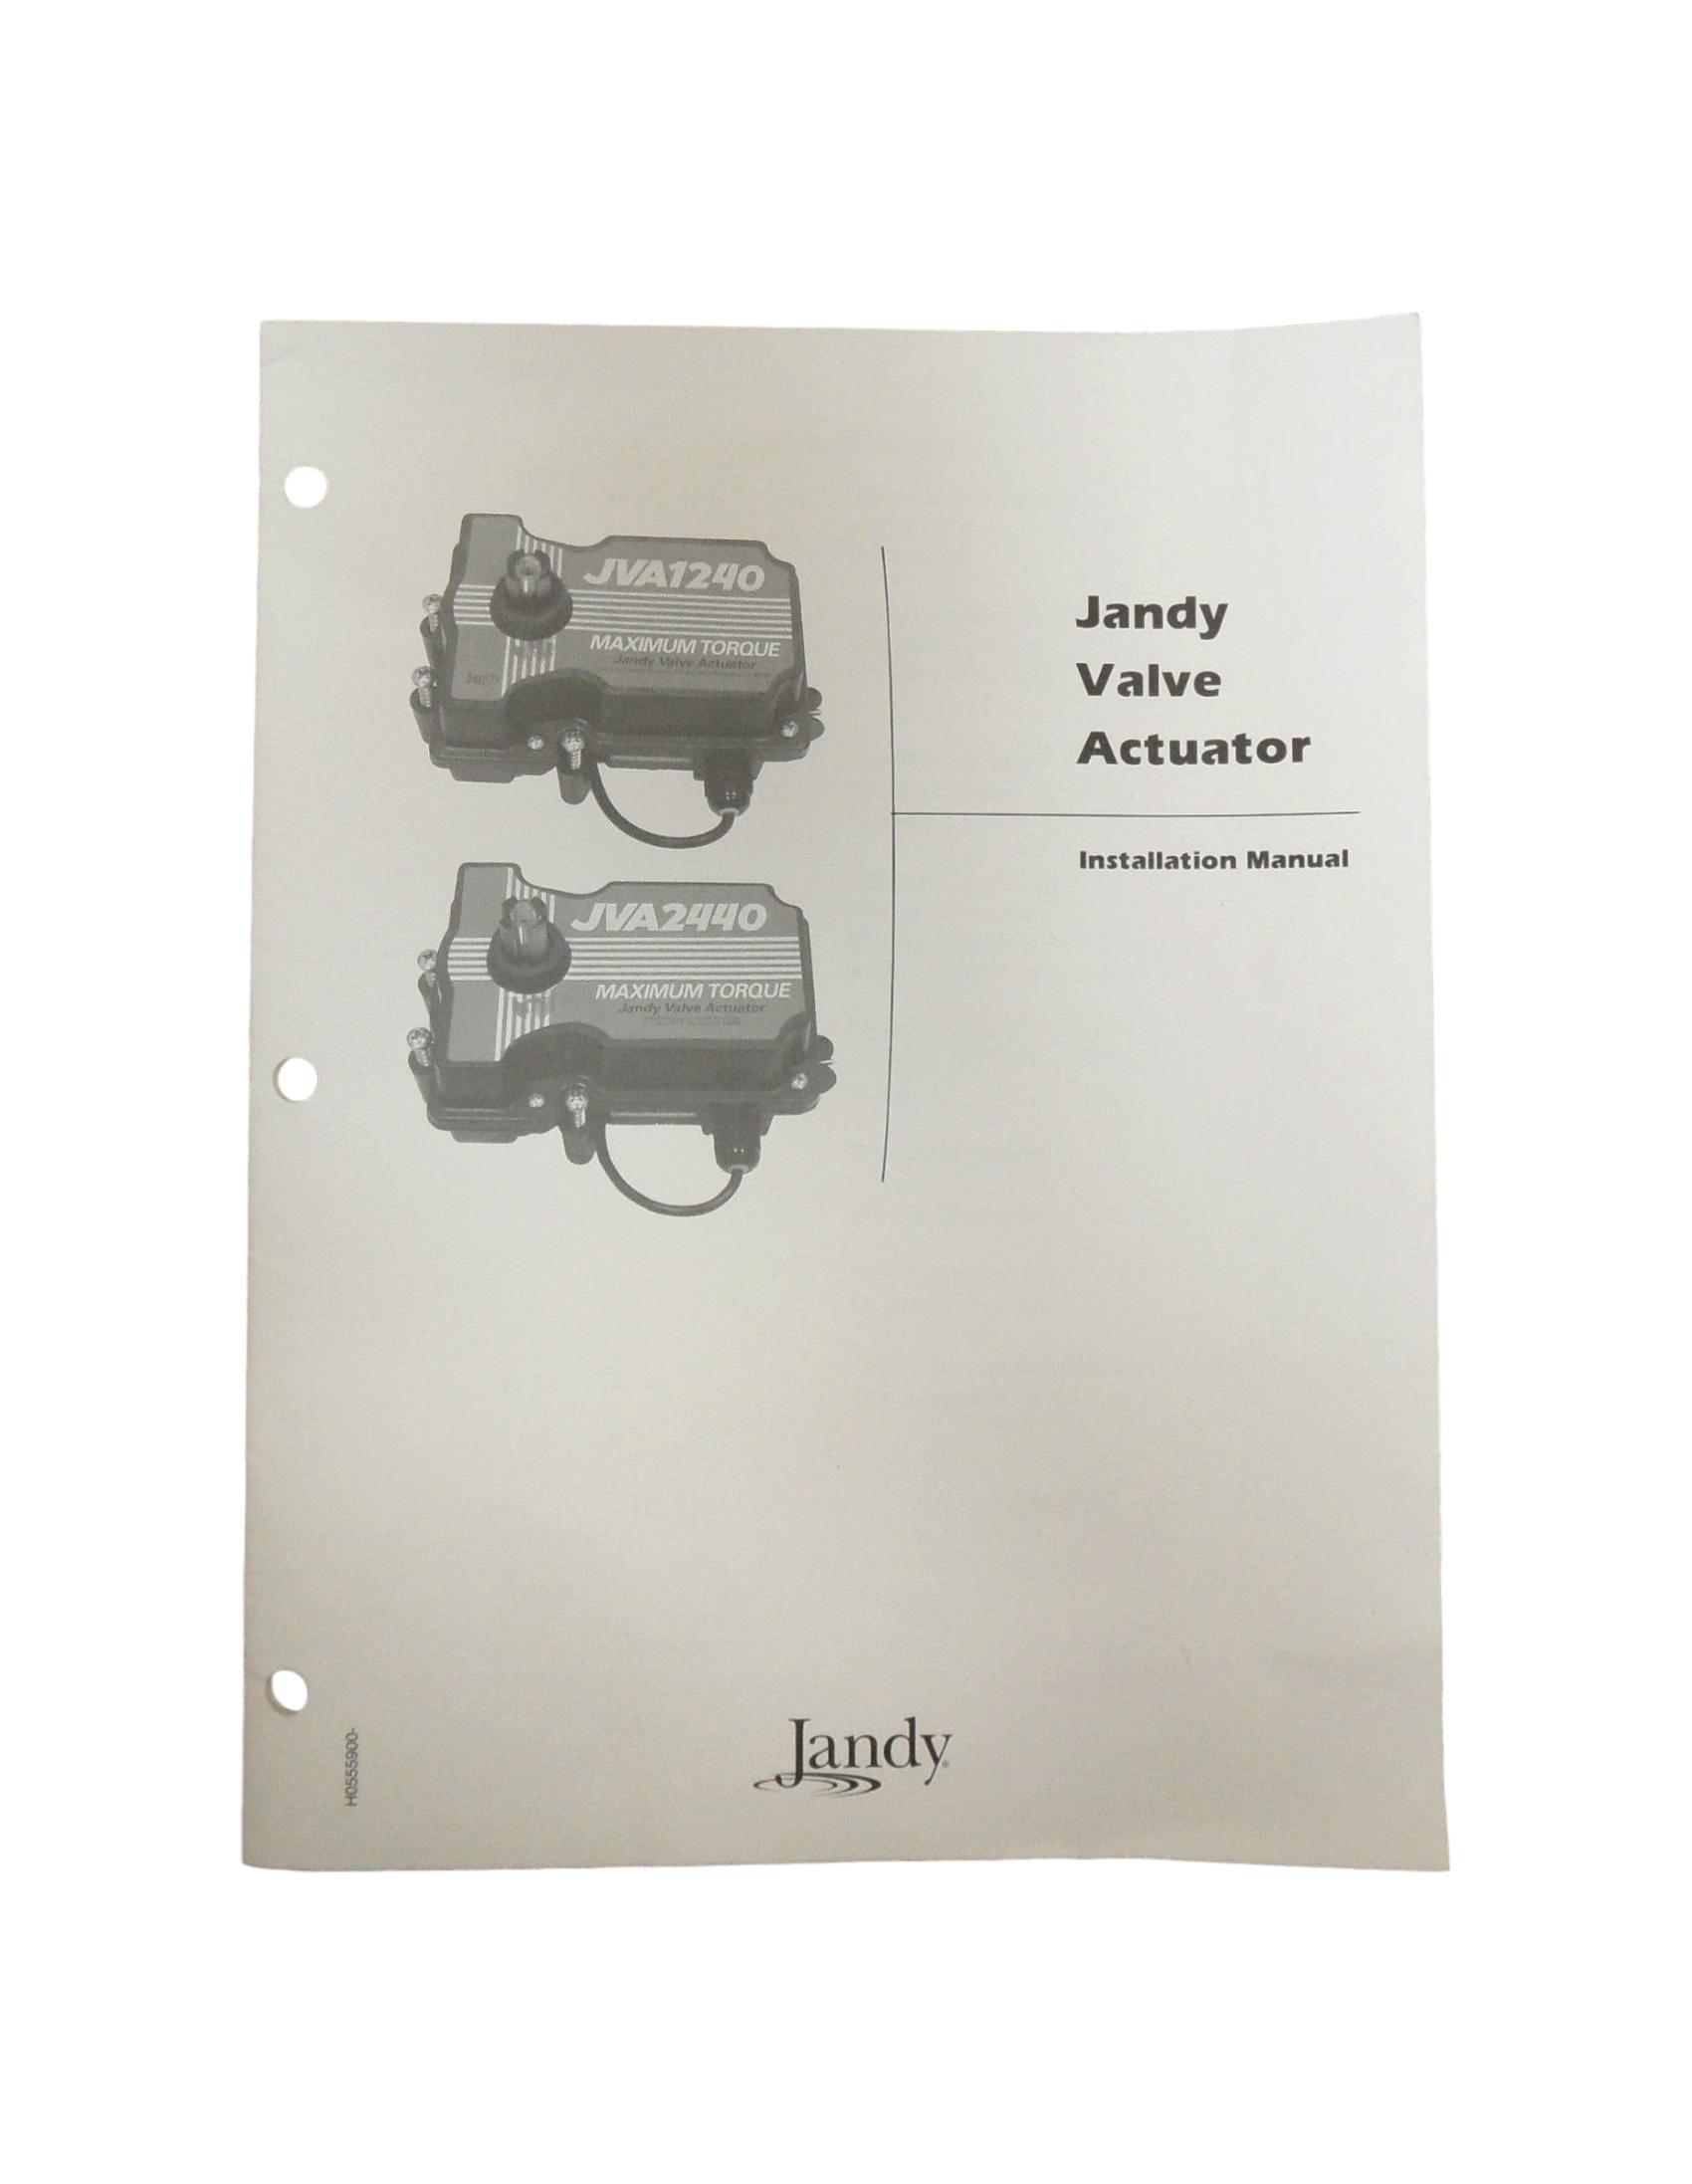 hight resolution of jandy jva1240jva2440 valve actuator installation owners manual